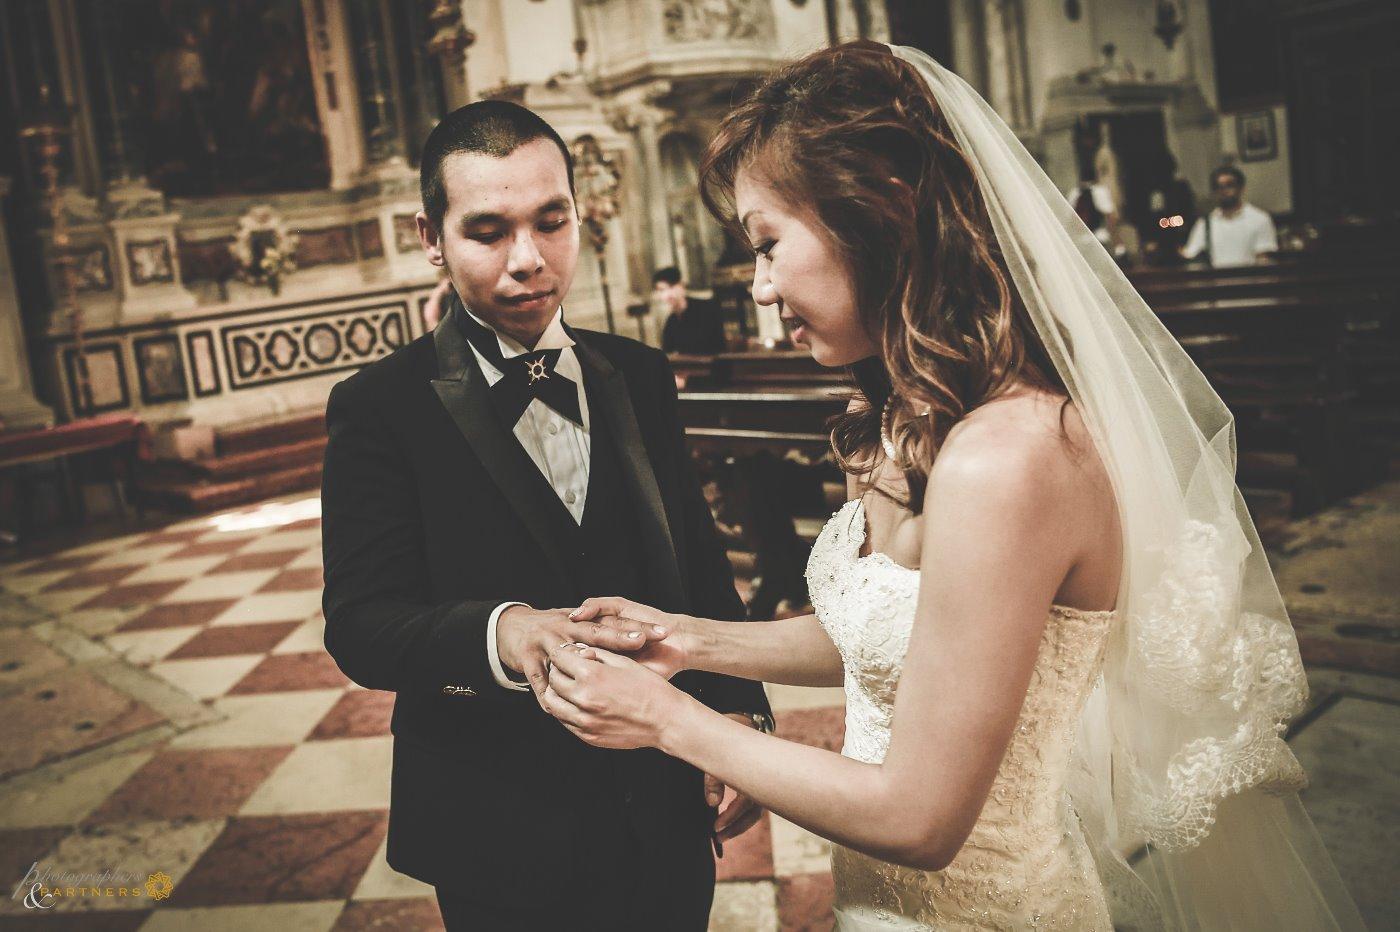 The Irene wedding ring.